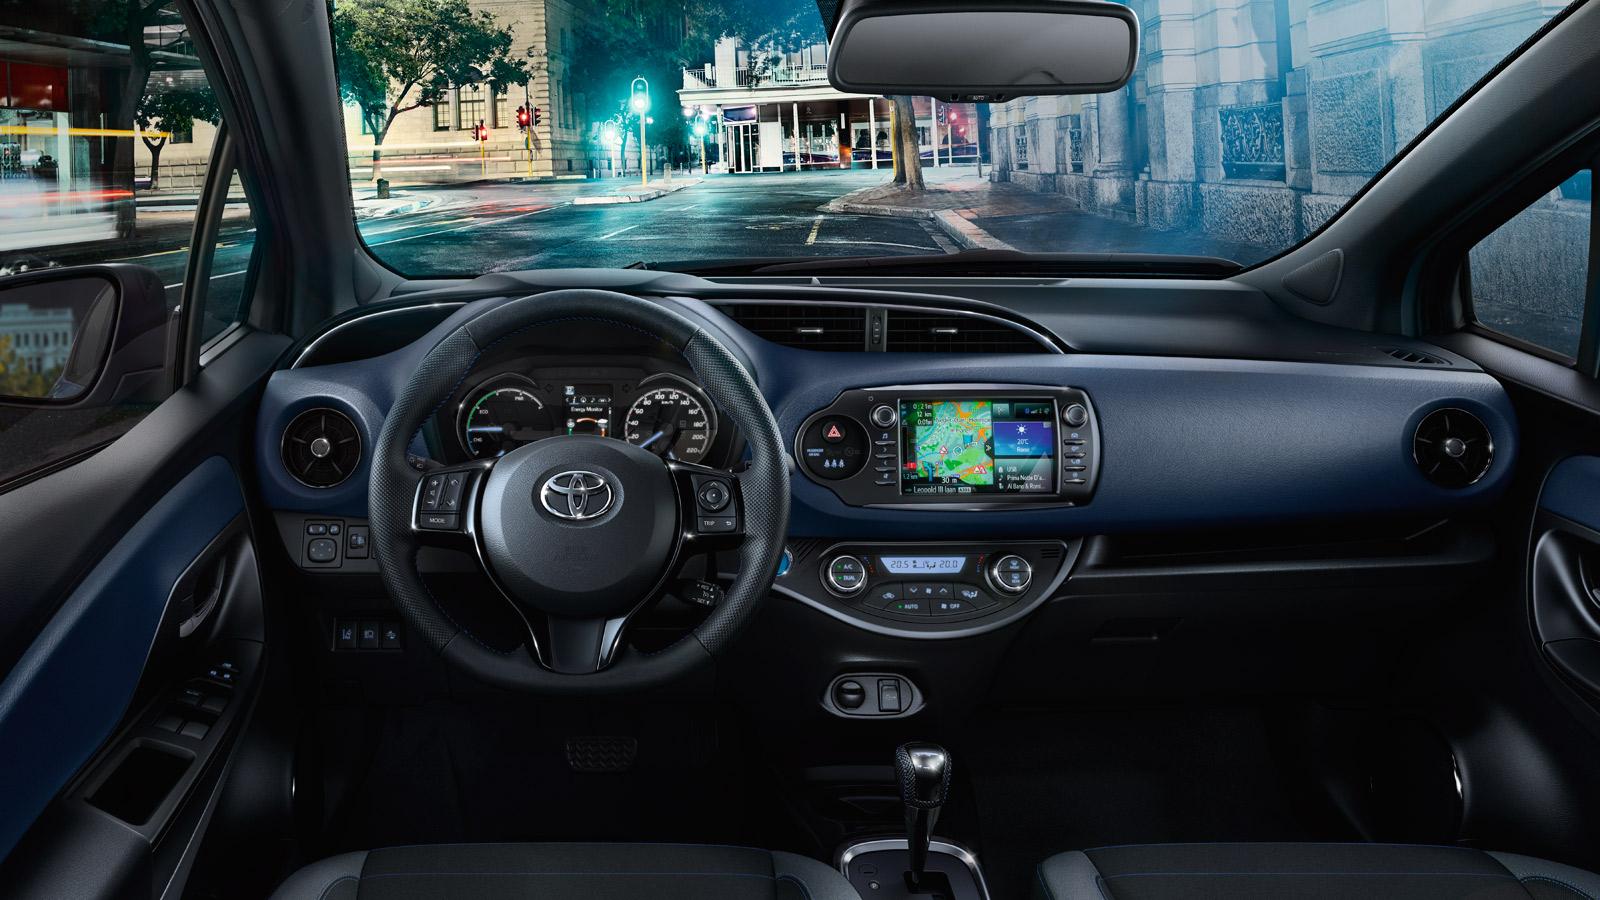 Toyota_Yaris_03.jpg